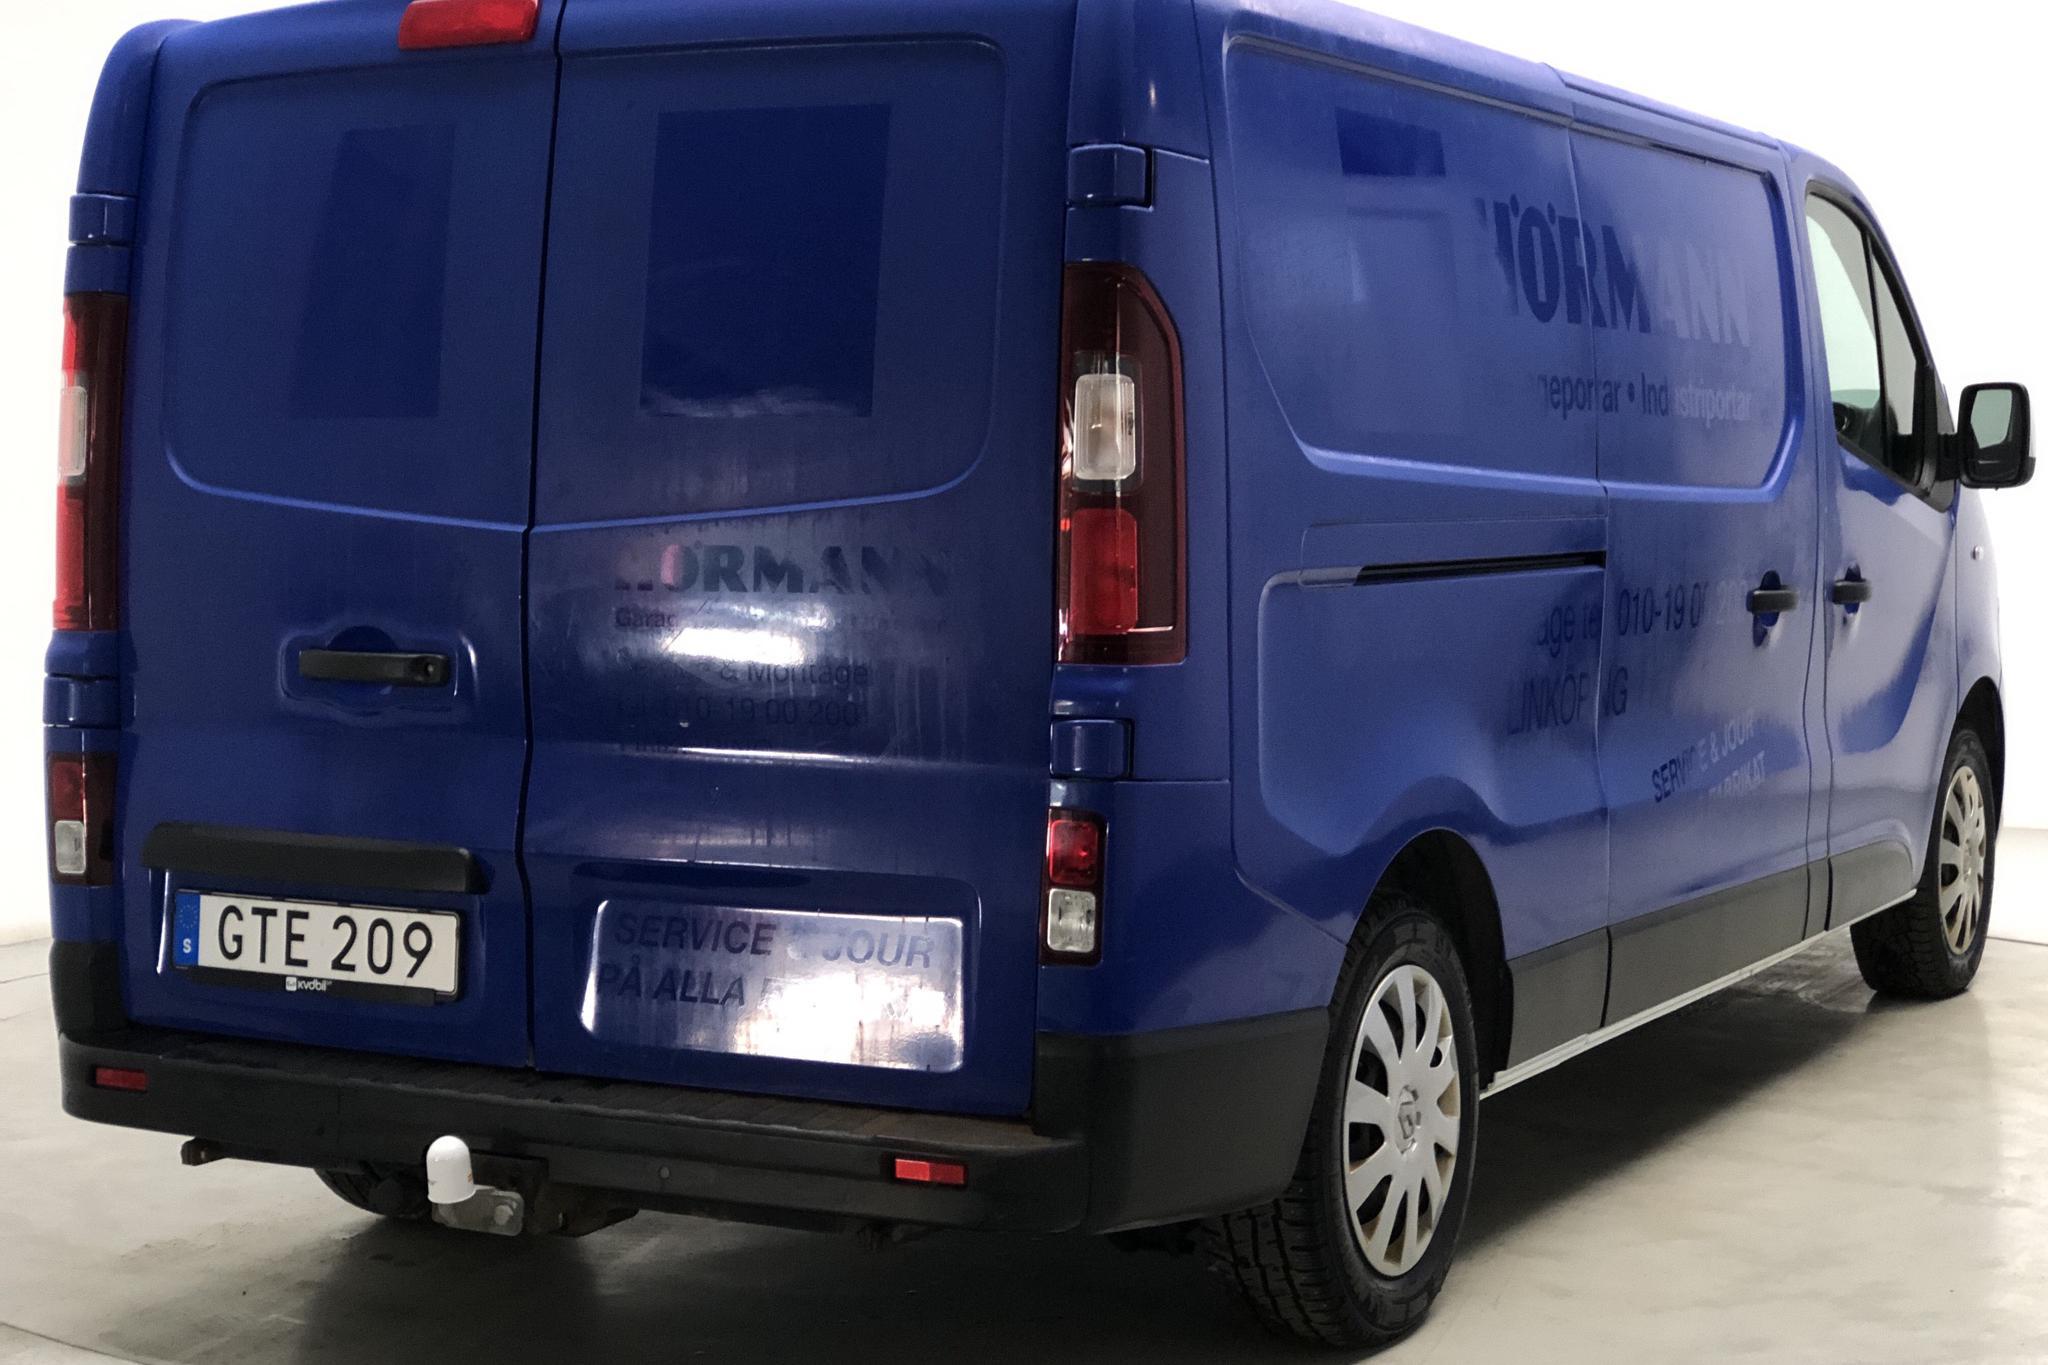 Renault Trafic 1.6 dCi Skåp (140hk) - 12 382 mil - Manuell - vit - 2015